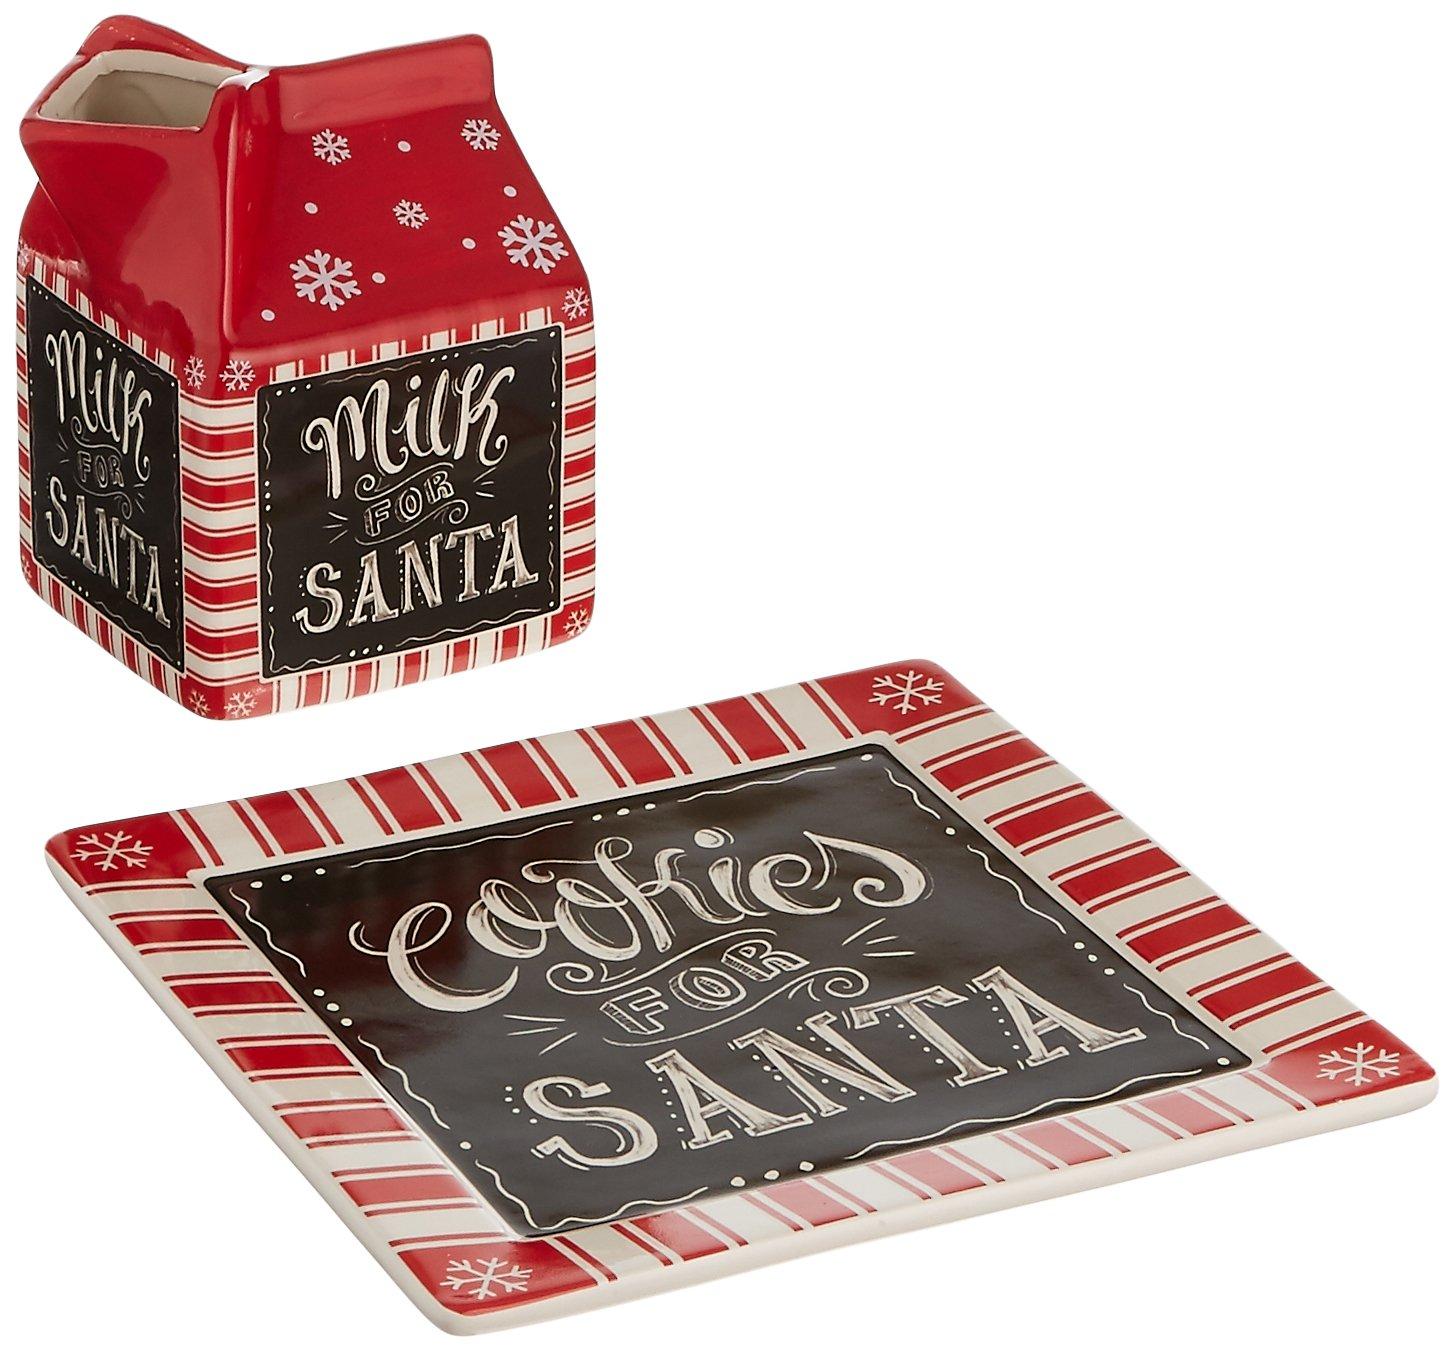 Burton and Burton Milk and Cookies for Santa Gift Set, Ceramic by burton+BURTON